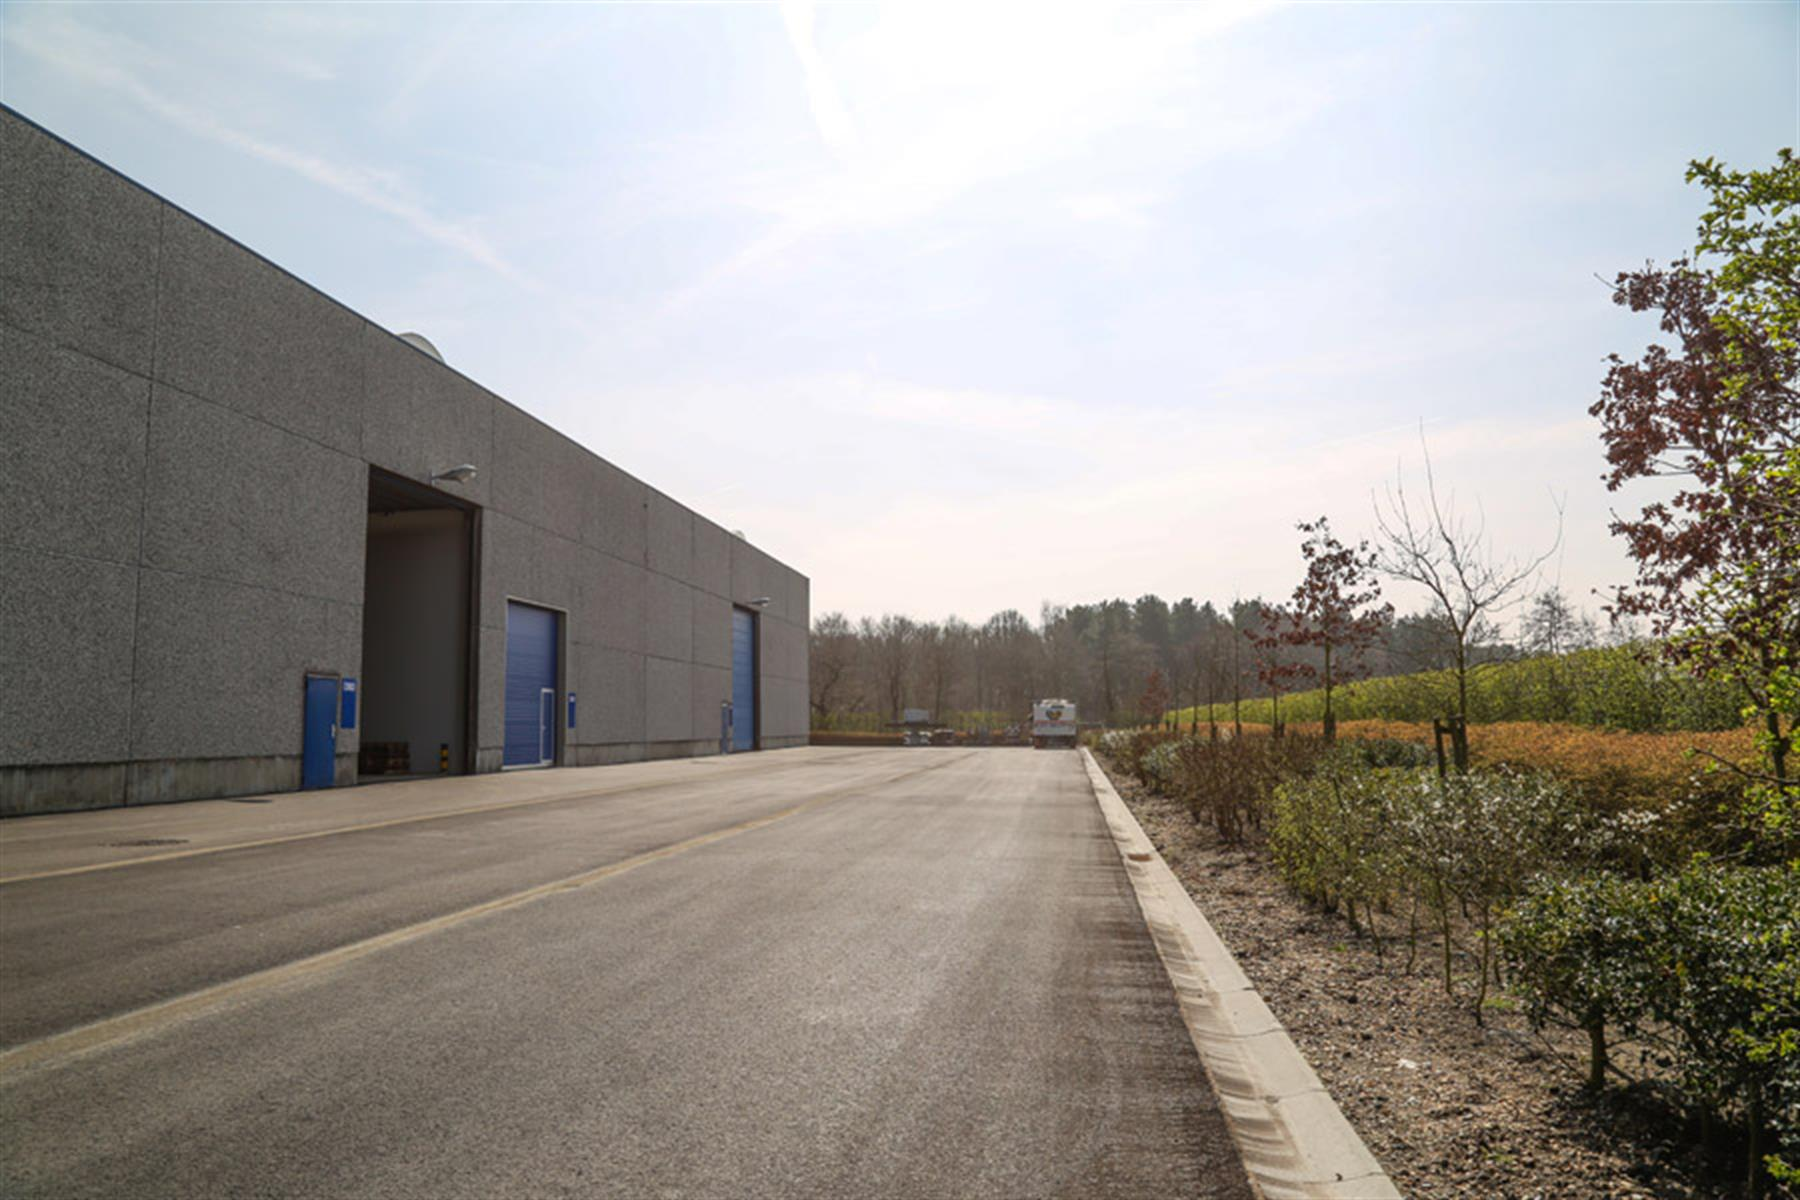 industrieel gebouw te huur KMO UNIT 1620m² MEERDERE LOADING DOCKS te KAPELLEN (B002) 1640m² - 2950 Kapellen, België 9